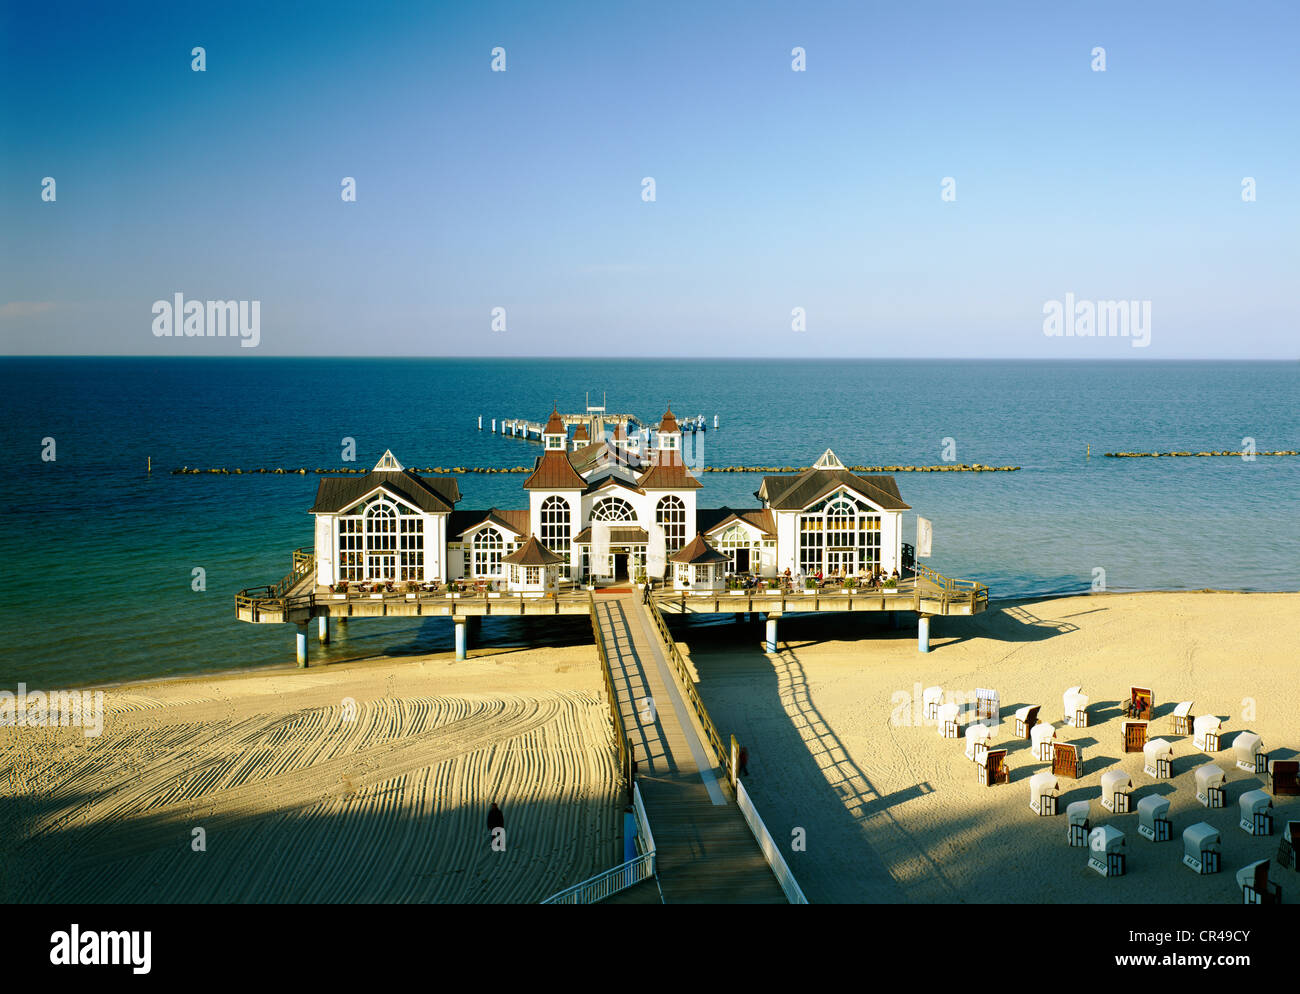 Pier, Sellin, Ruegen, Mecklenburg-Vorpommern, Germany, Europe - Stock Image